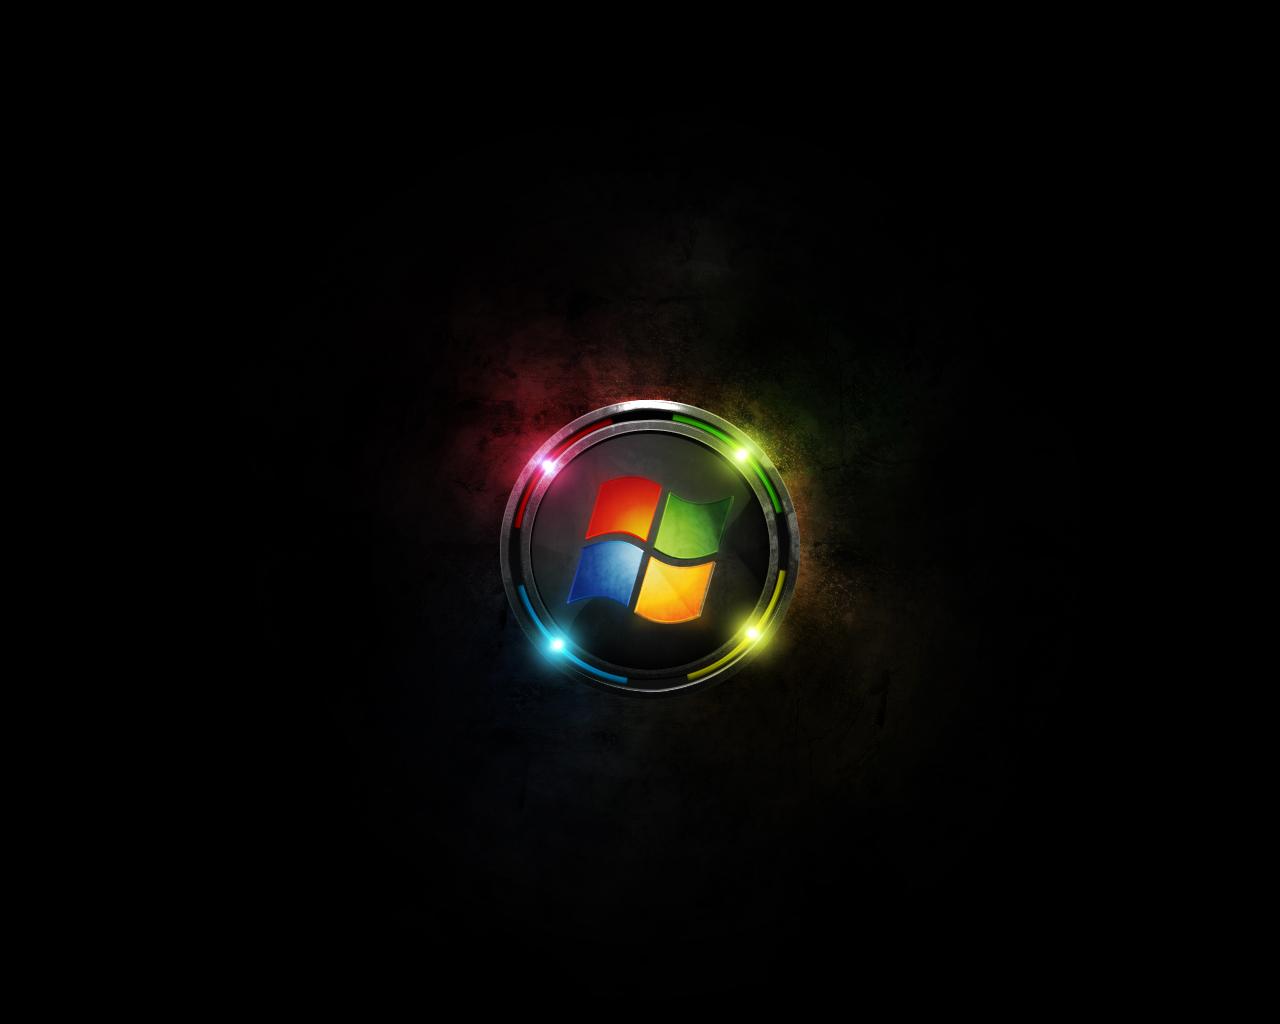 Windows 7 Wallpaper Windows Vista Wallpaper Windows Wallpaper Cool 1280x1024